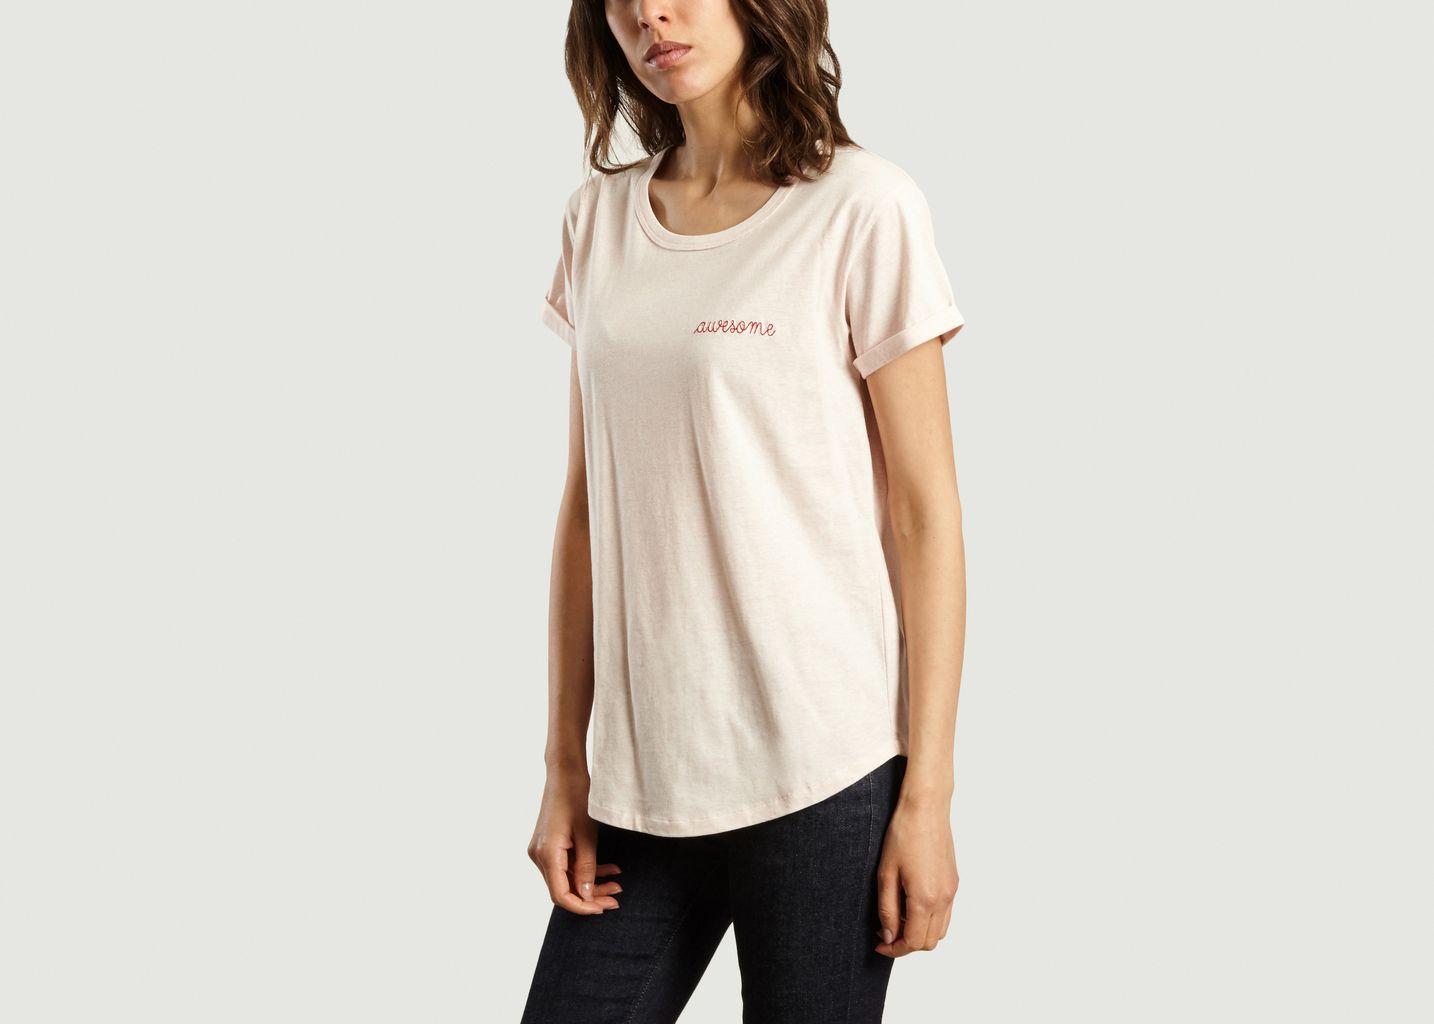 T-shirt Awesome  - Maison Labiche